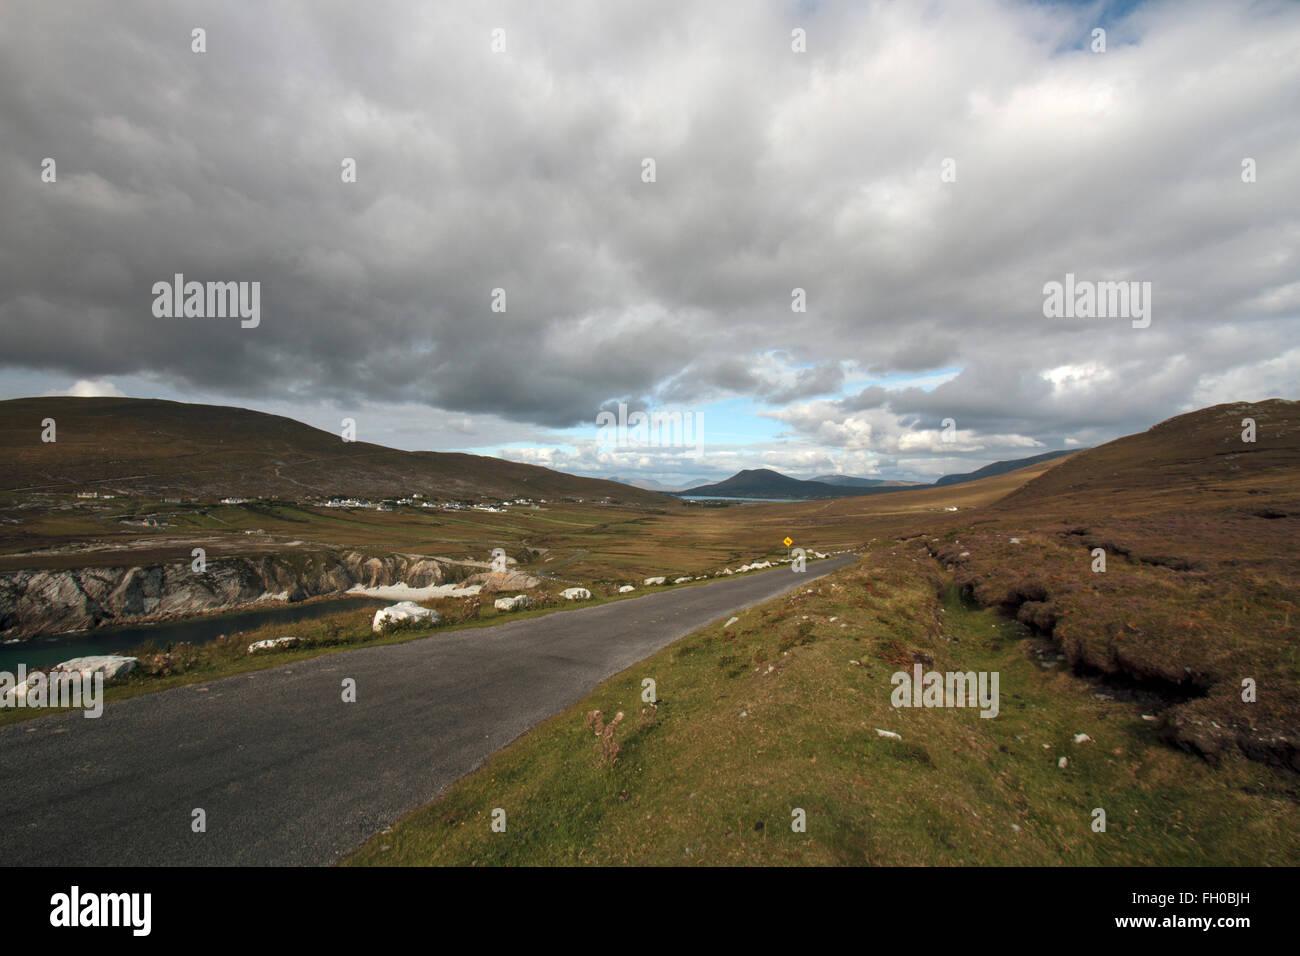 Road, Sea and Cliffs, Achill Island, Co. Mayo, Republic of Ireland - Stock Image